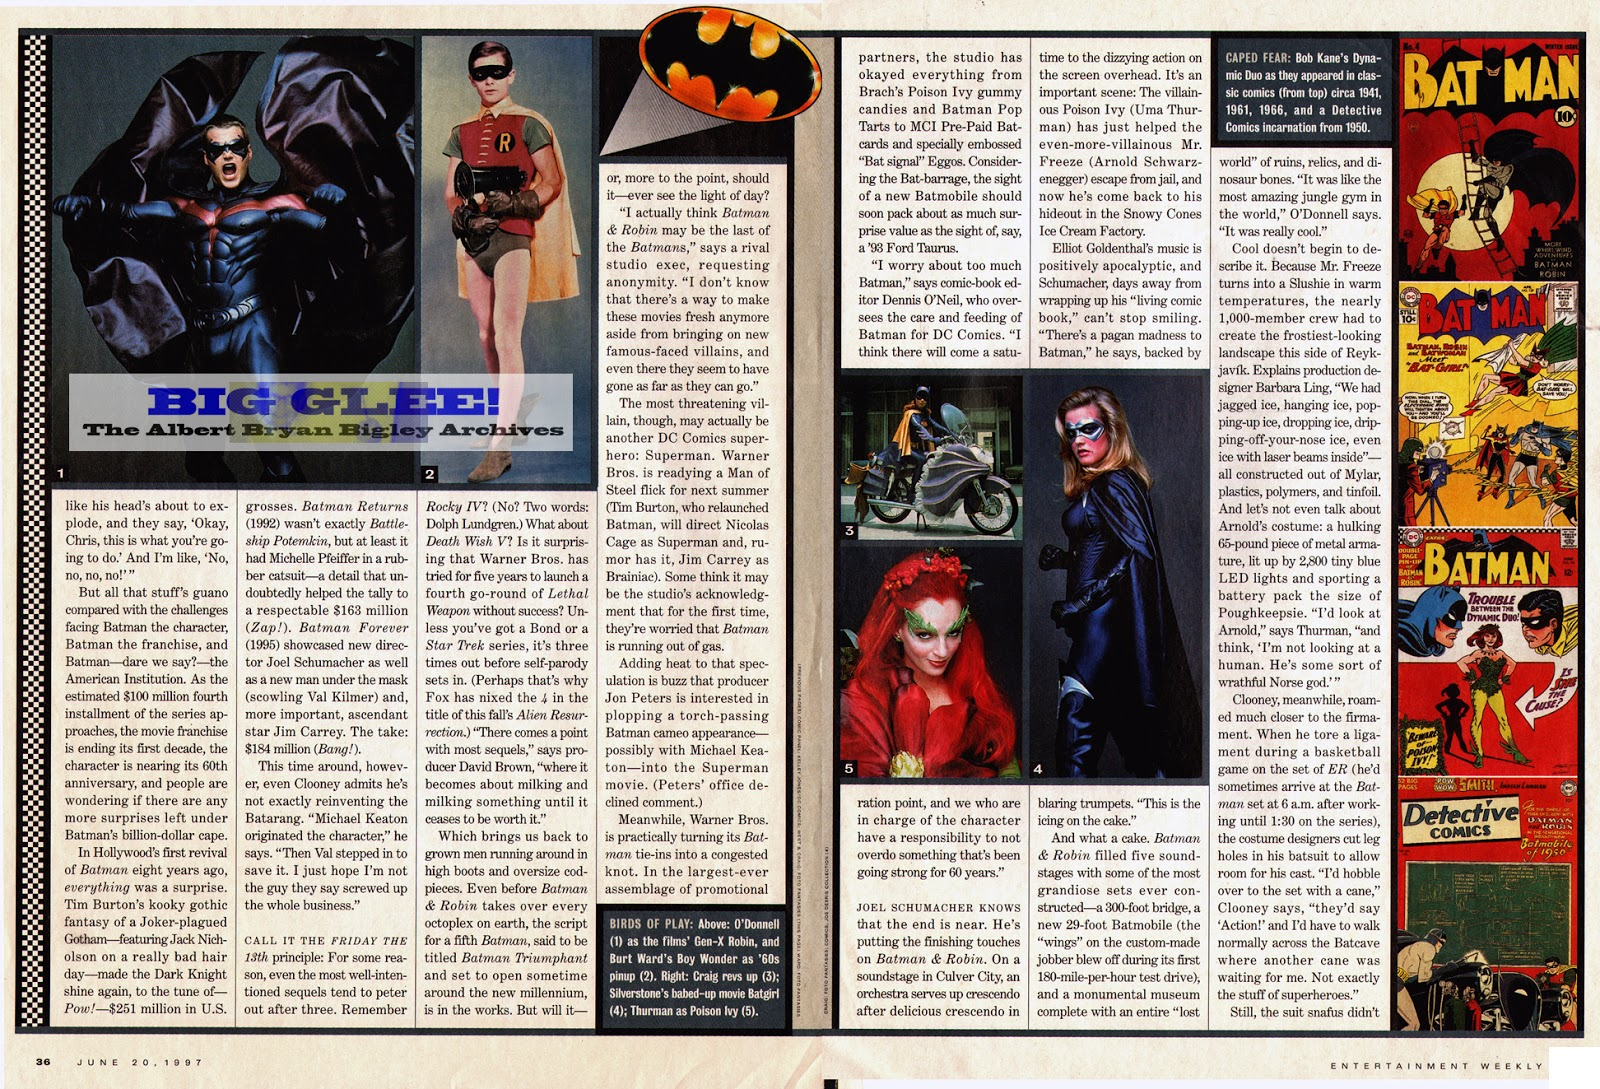 http://1.bp.blogspot.com/-hsmuwFELtMg/UNRzb6uaL6I/AAAAAAAAMKw/5FSnGWU7GLg/s1600/batman+and+robin+1997+mr.+freeze+arnold+uma+poison+ivy+robin+burt+ward+chris+o\'donnell+movie+thurman+schwarzenegger+cloney+dc+comics+batgirl+2.jpg